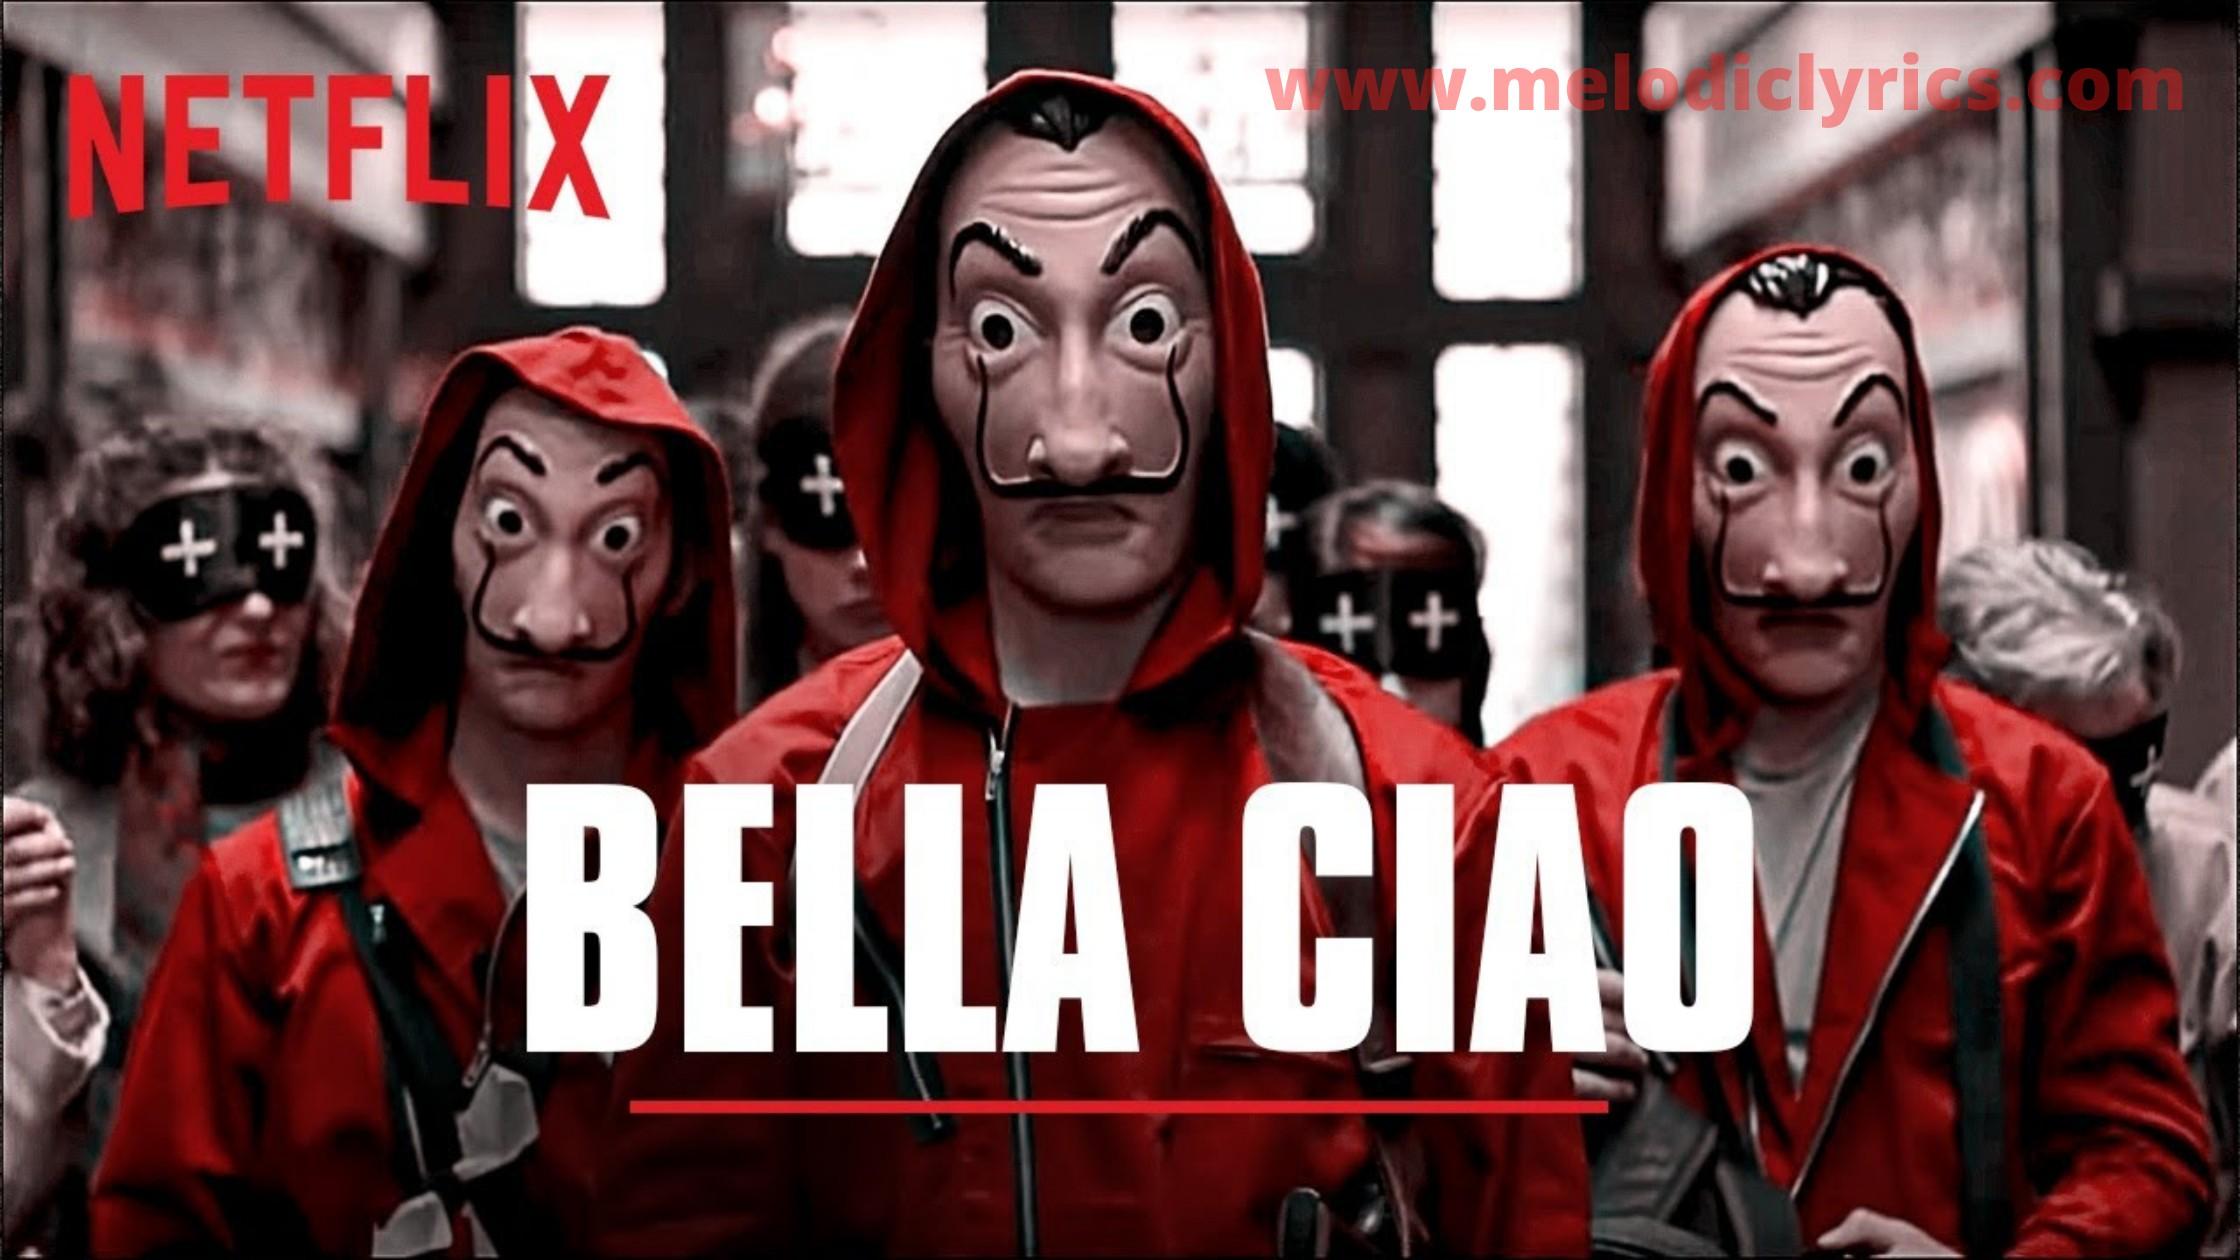 Bella ciao lyrics in English | Hindi | Spanish | la casa de papel | Money  heist lyrics